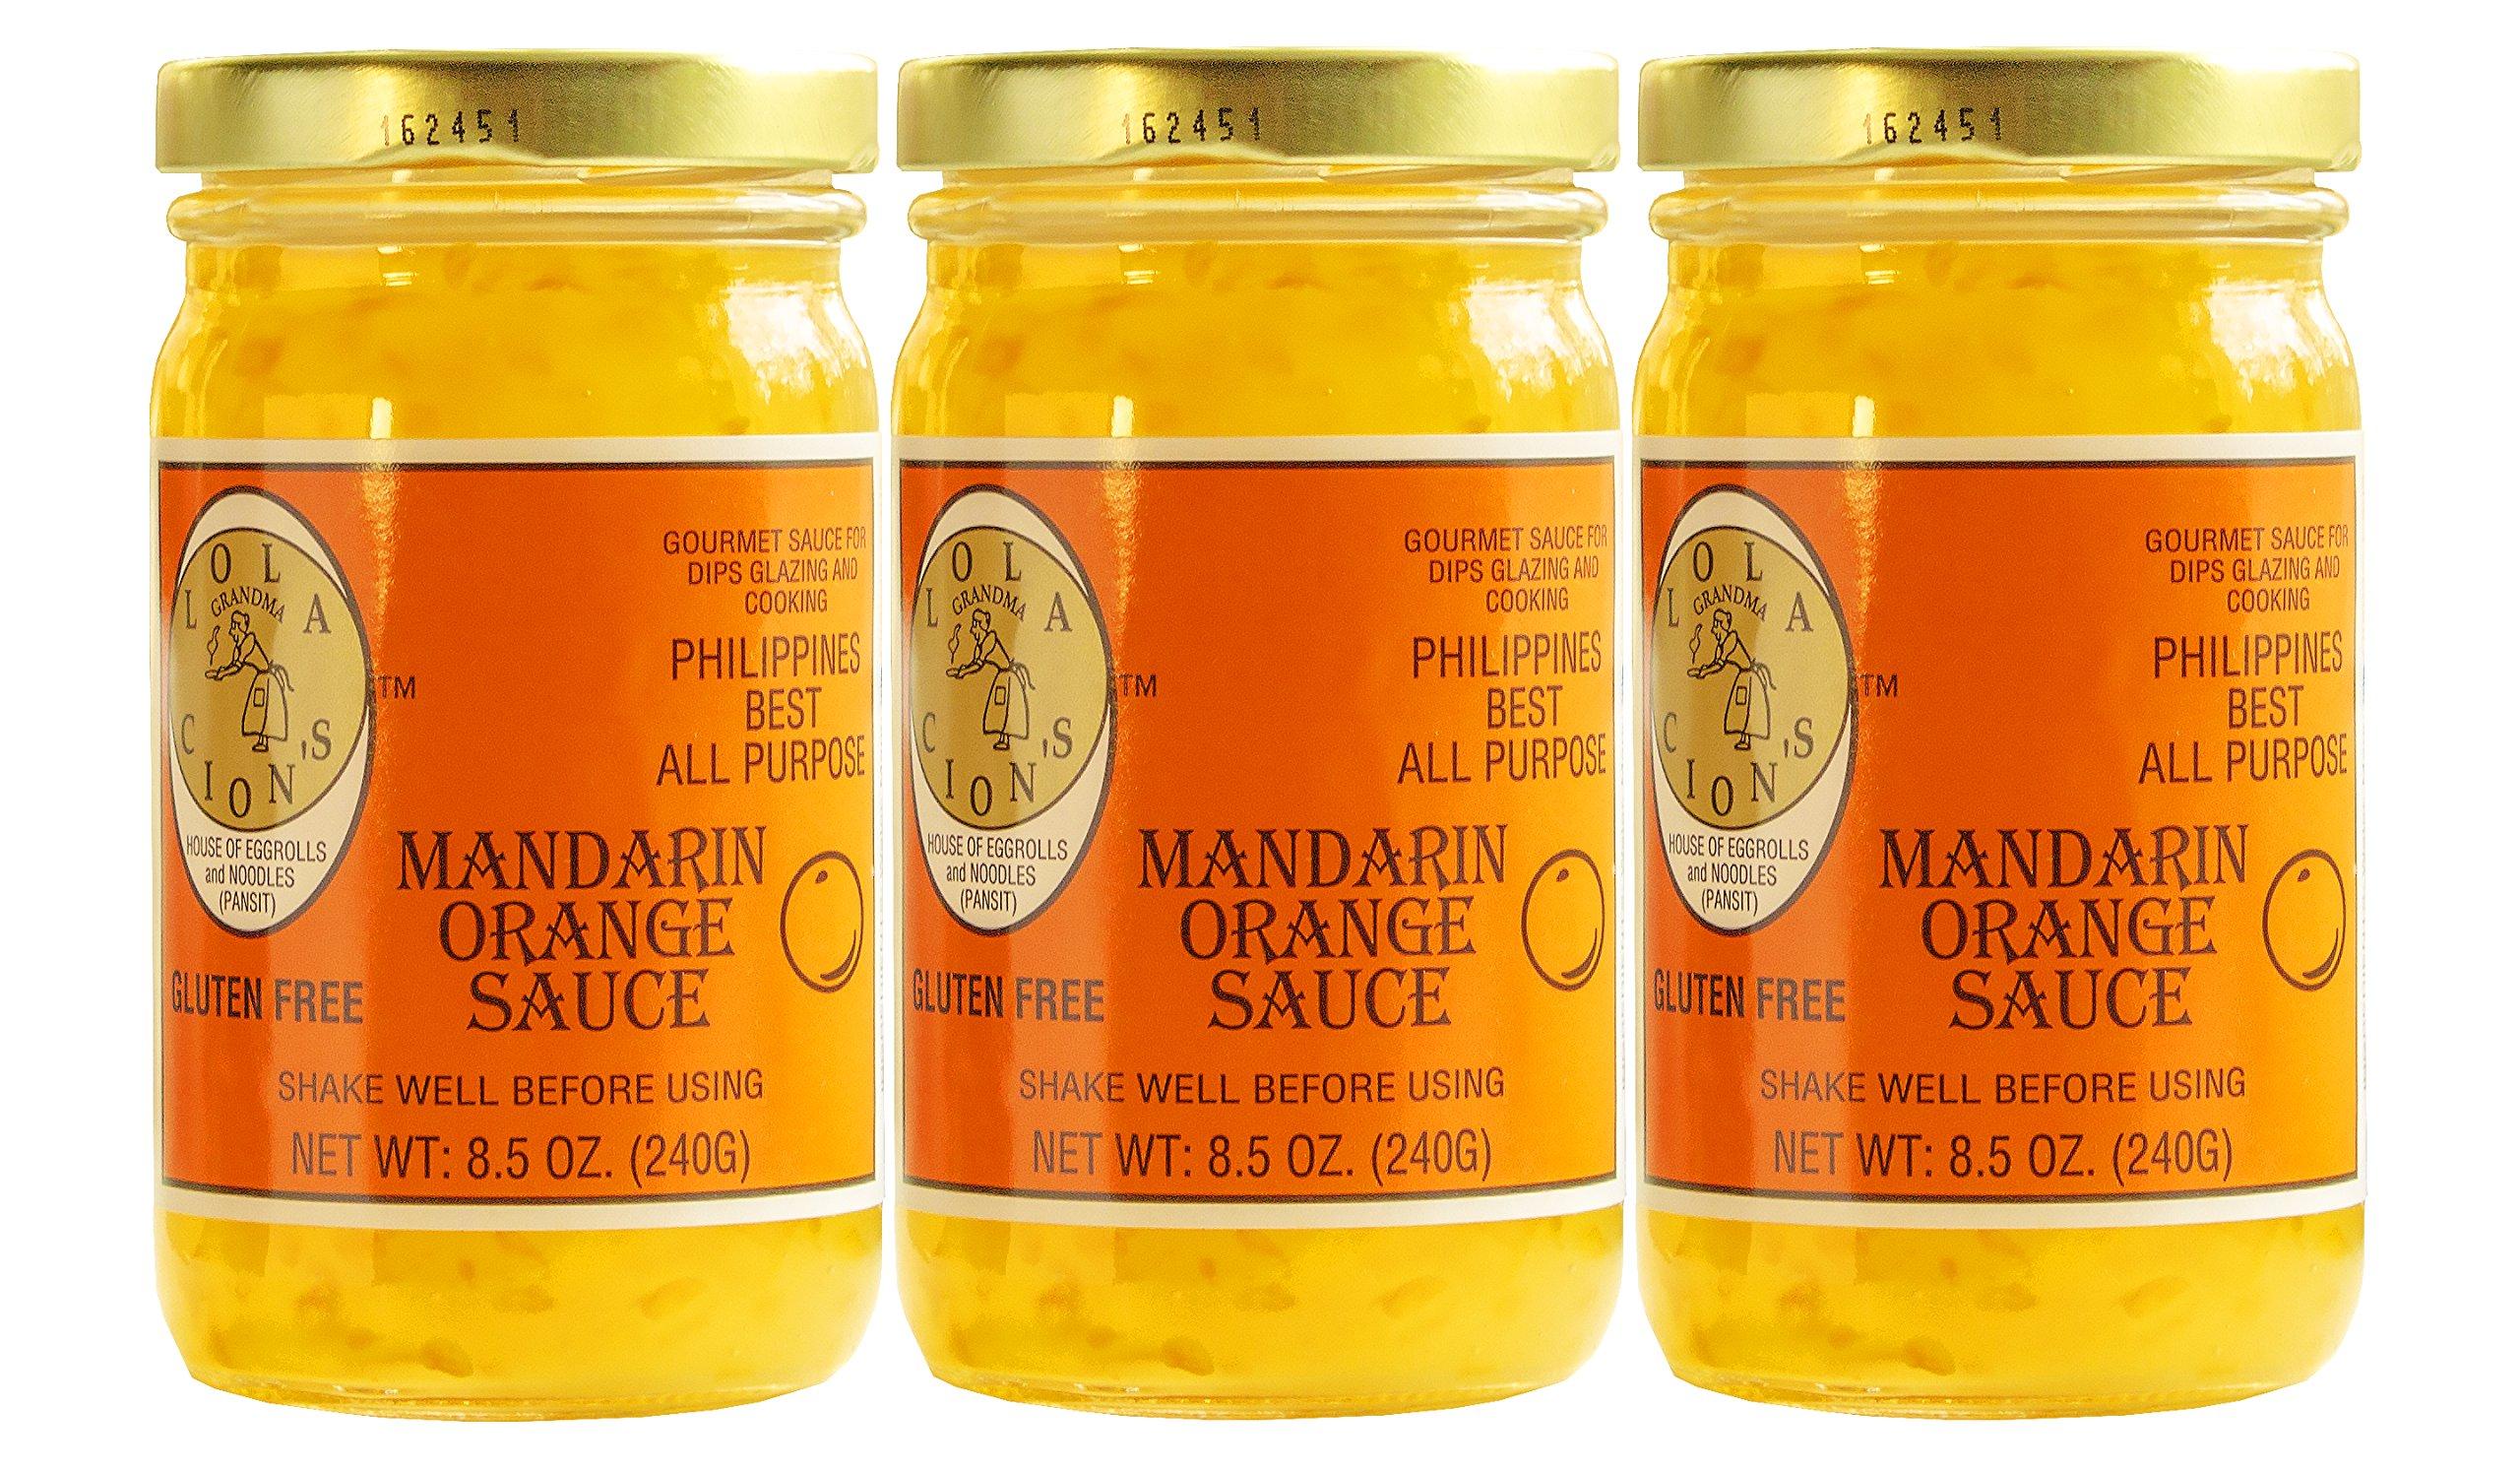 Lola Cion's Mandarin Orange Sauce (8.5 oz.) 3 pack bottles. All Natural, Gluten Free Multipurpose Glaze, Dressing, Topping, or Dip   Sweet, Low -Sugar Flavor   Cooking and Baking by Lola Cion's (Image #1)